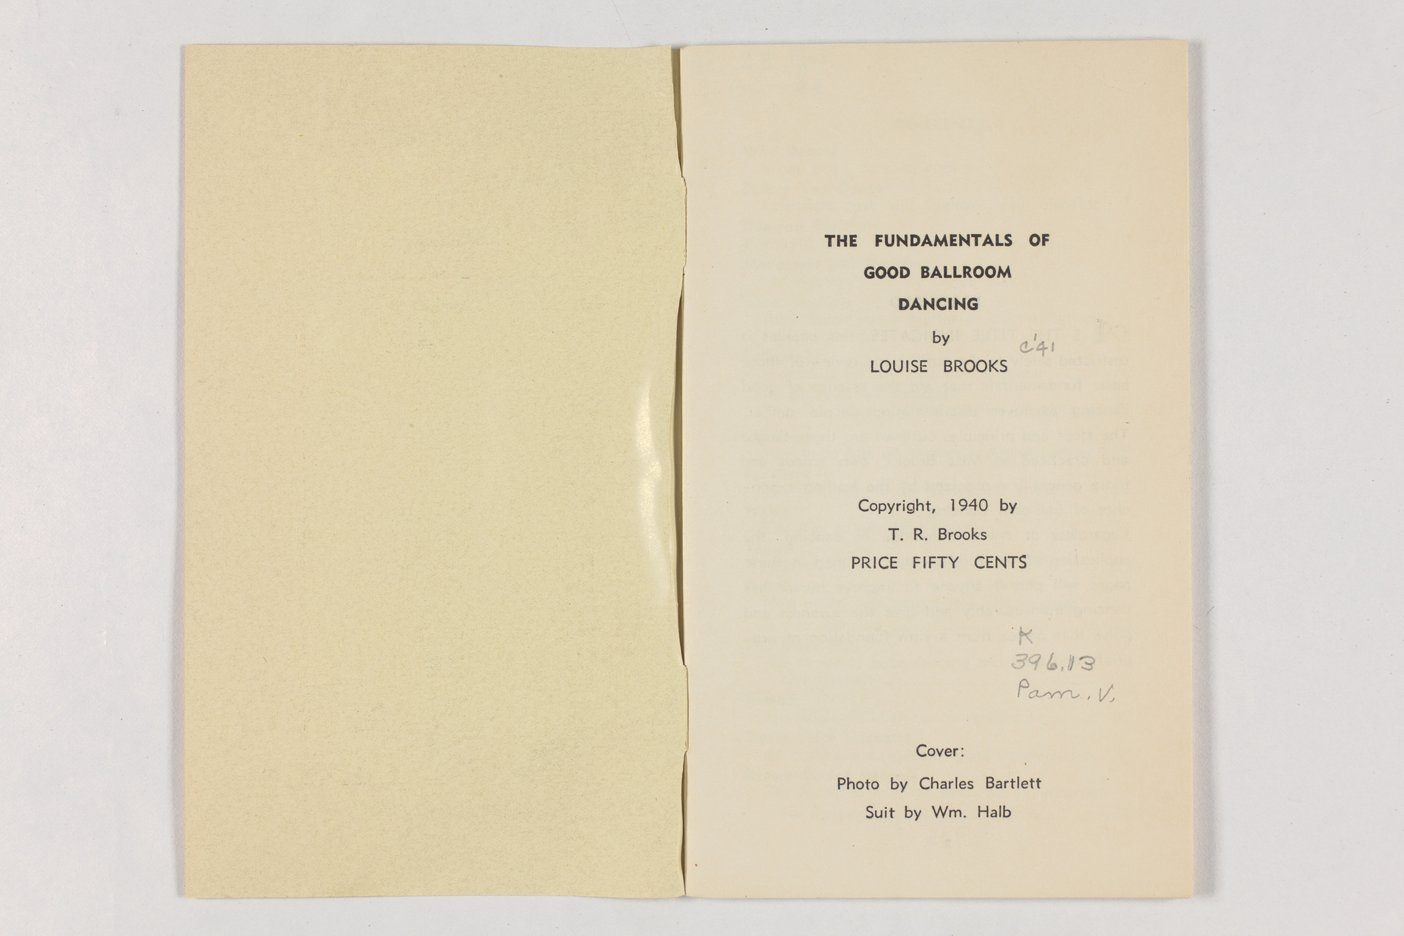 The fundamentals of good ballroom dancing - Blank page-1